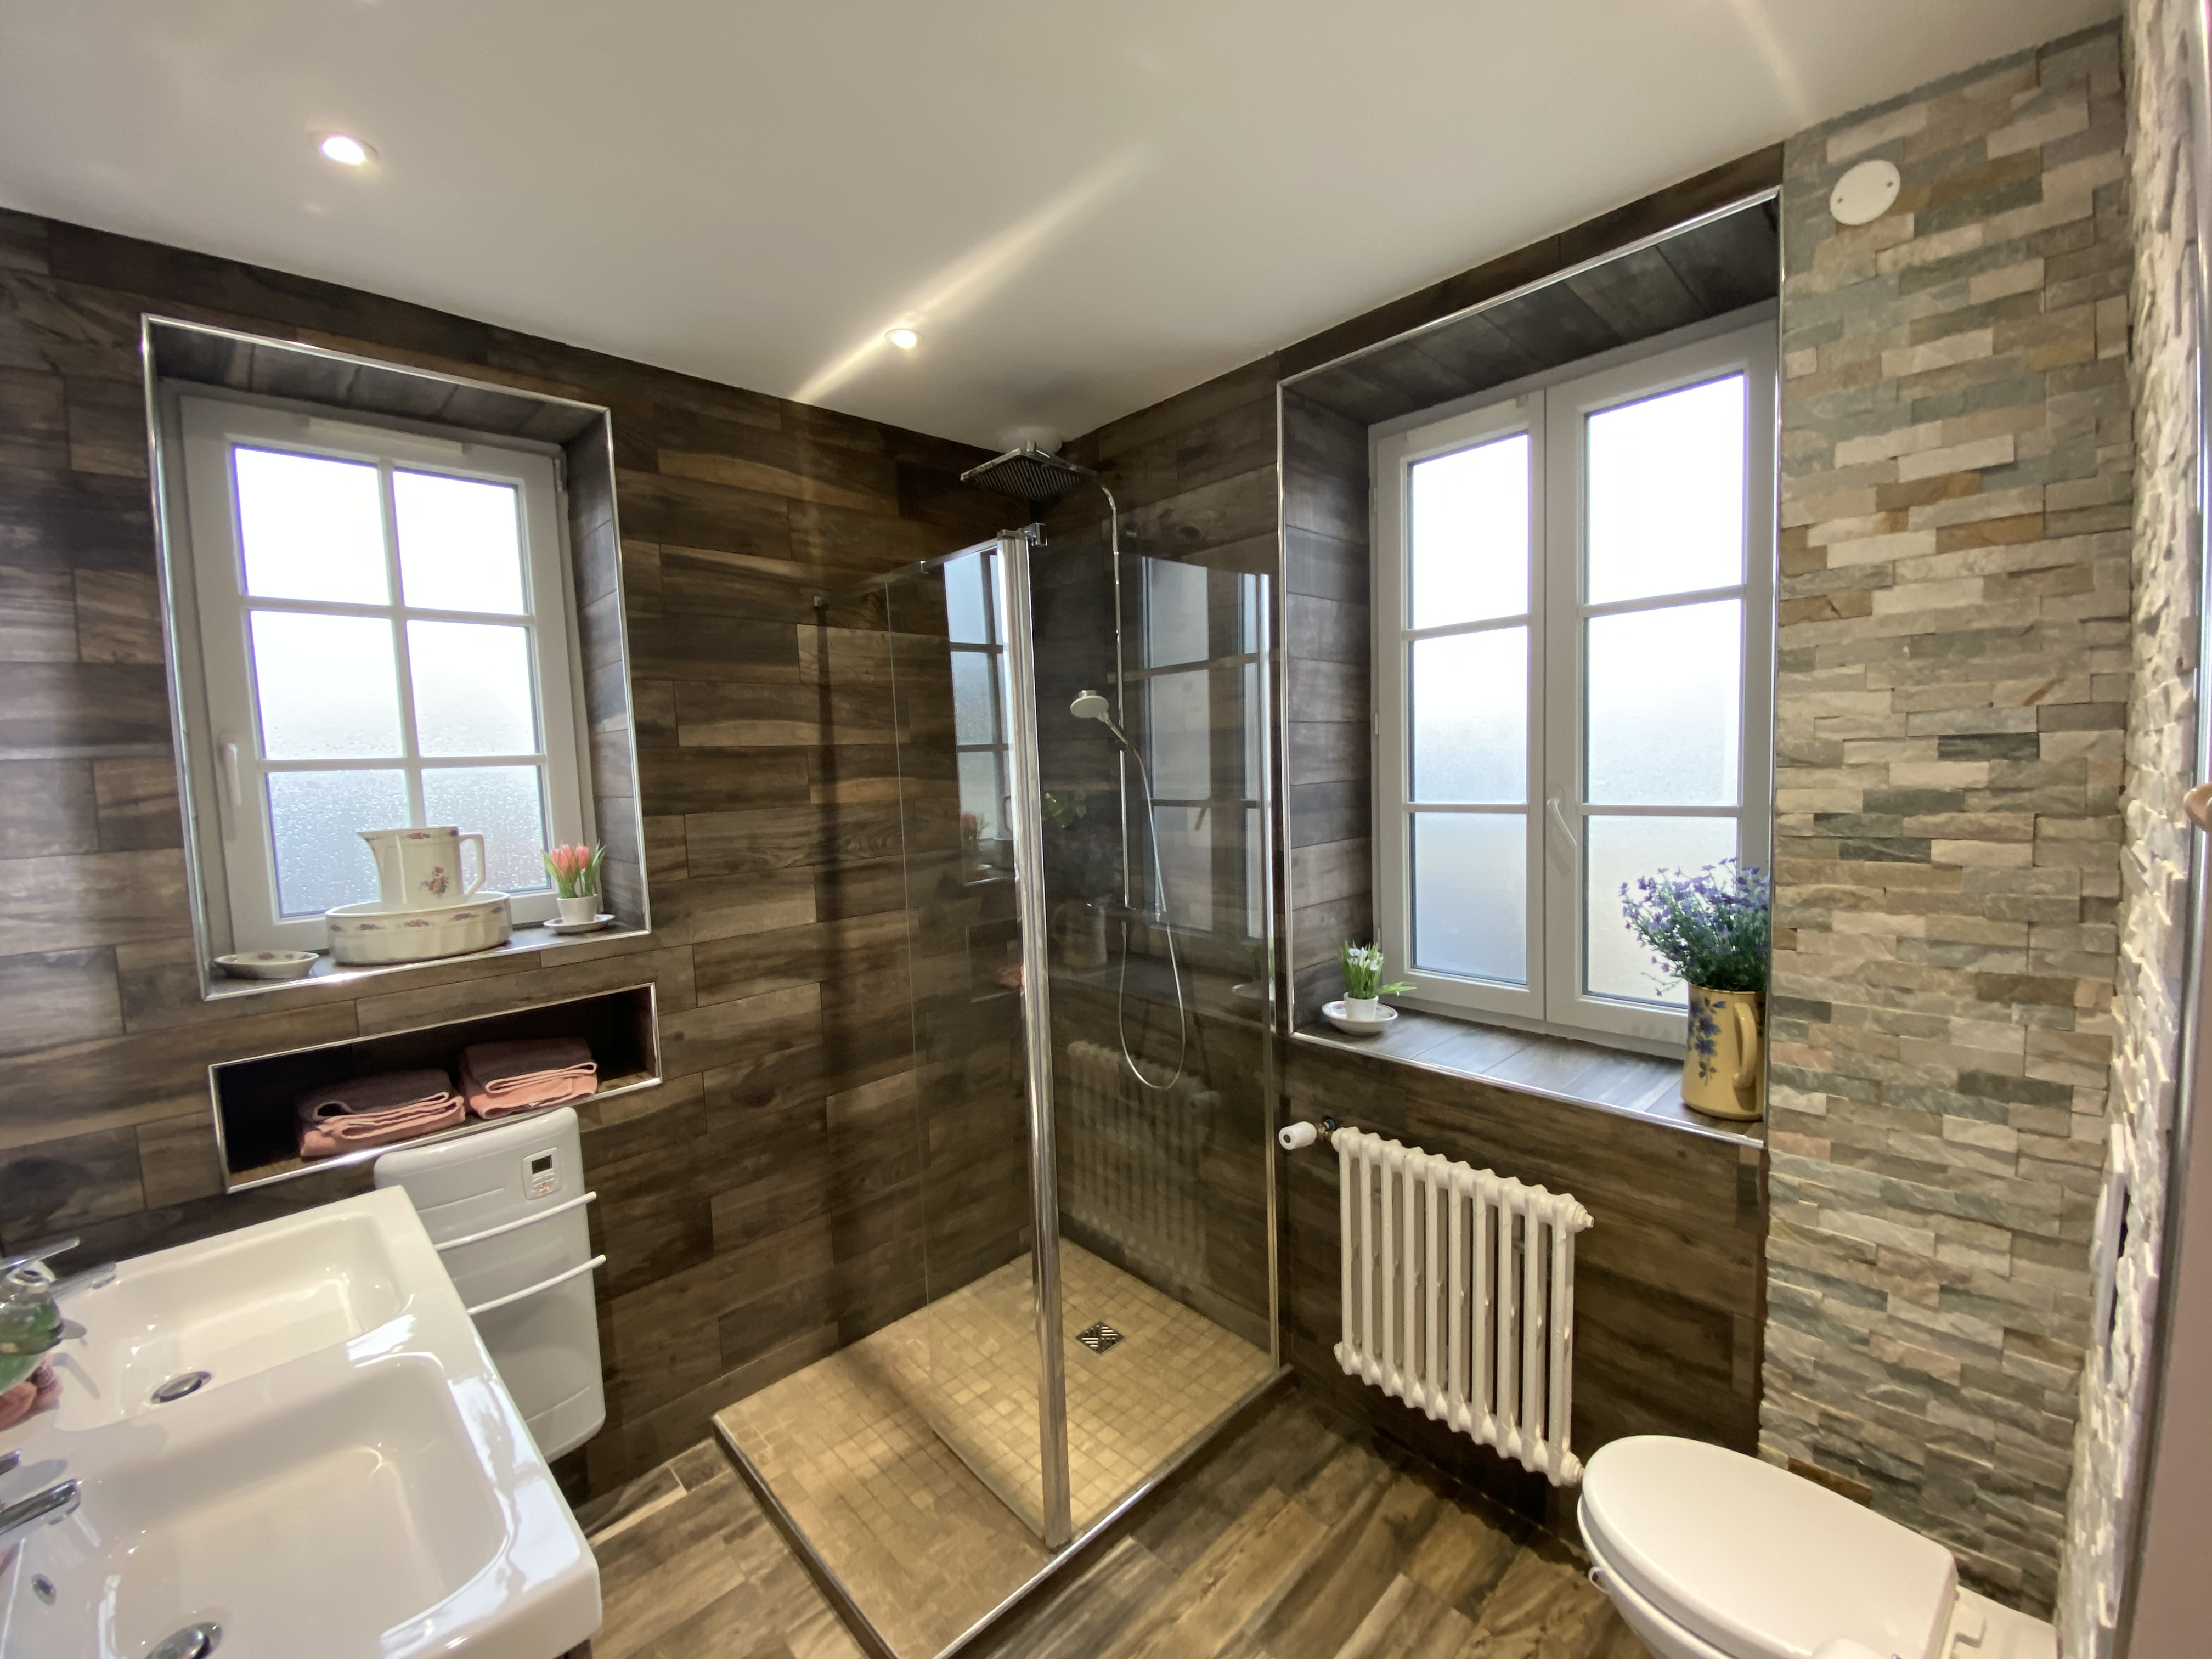 DDAY AVIATORS Le Manoir Bathroom B7